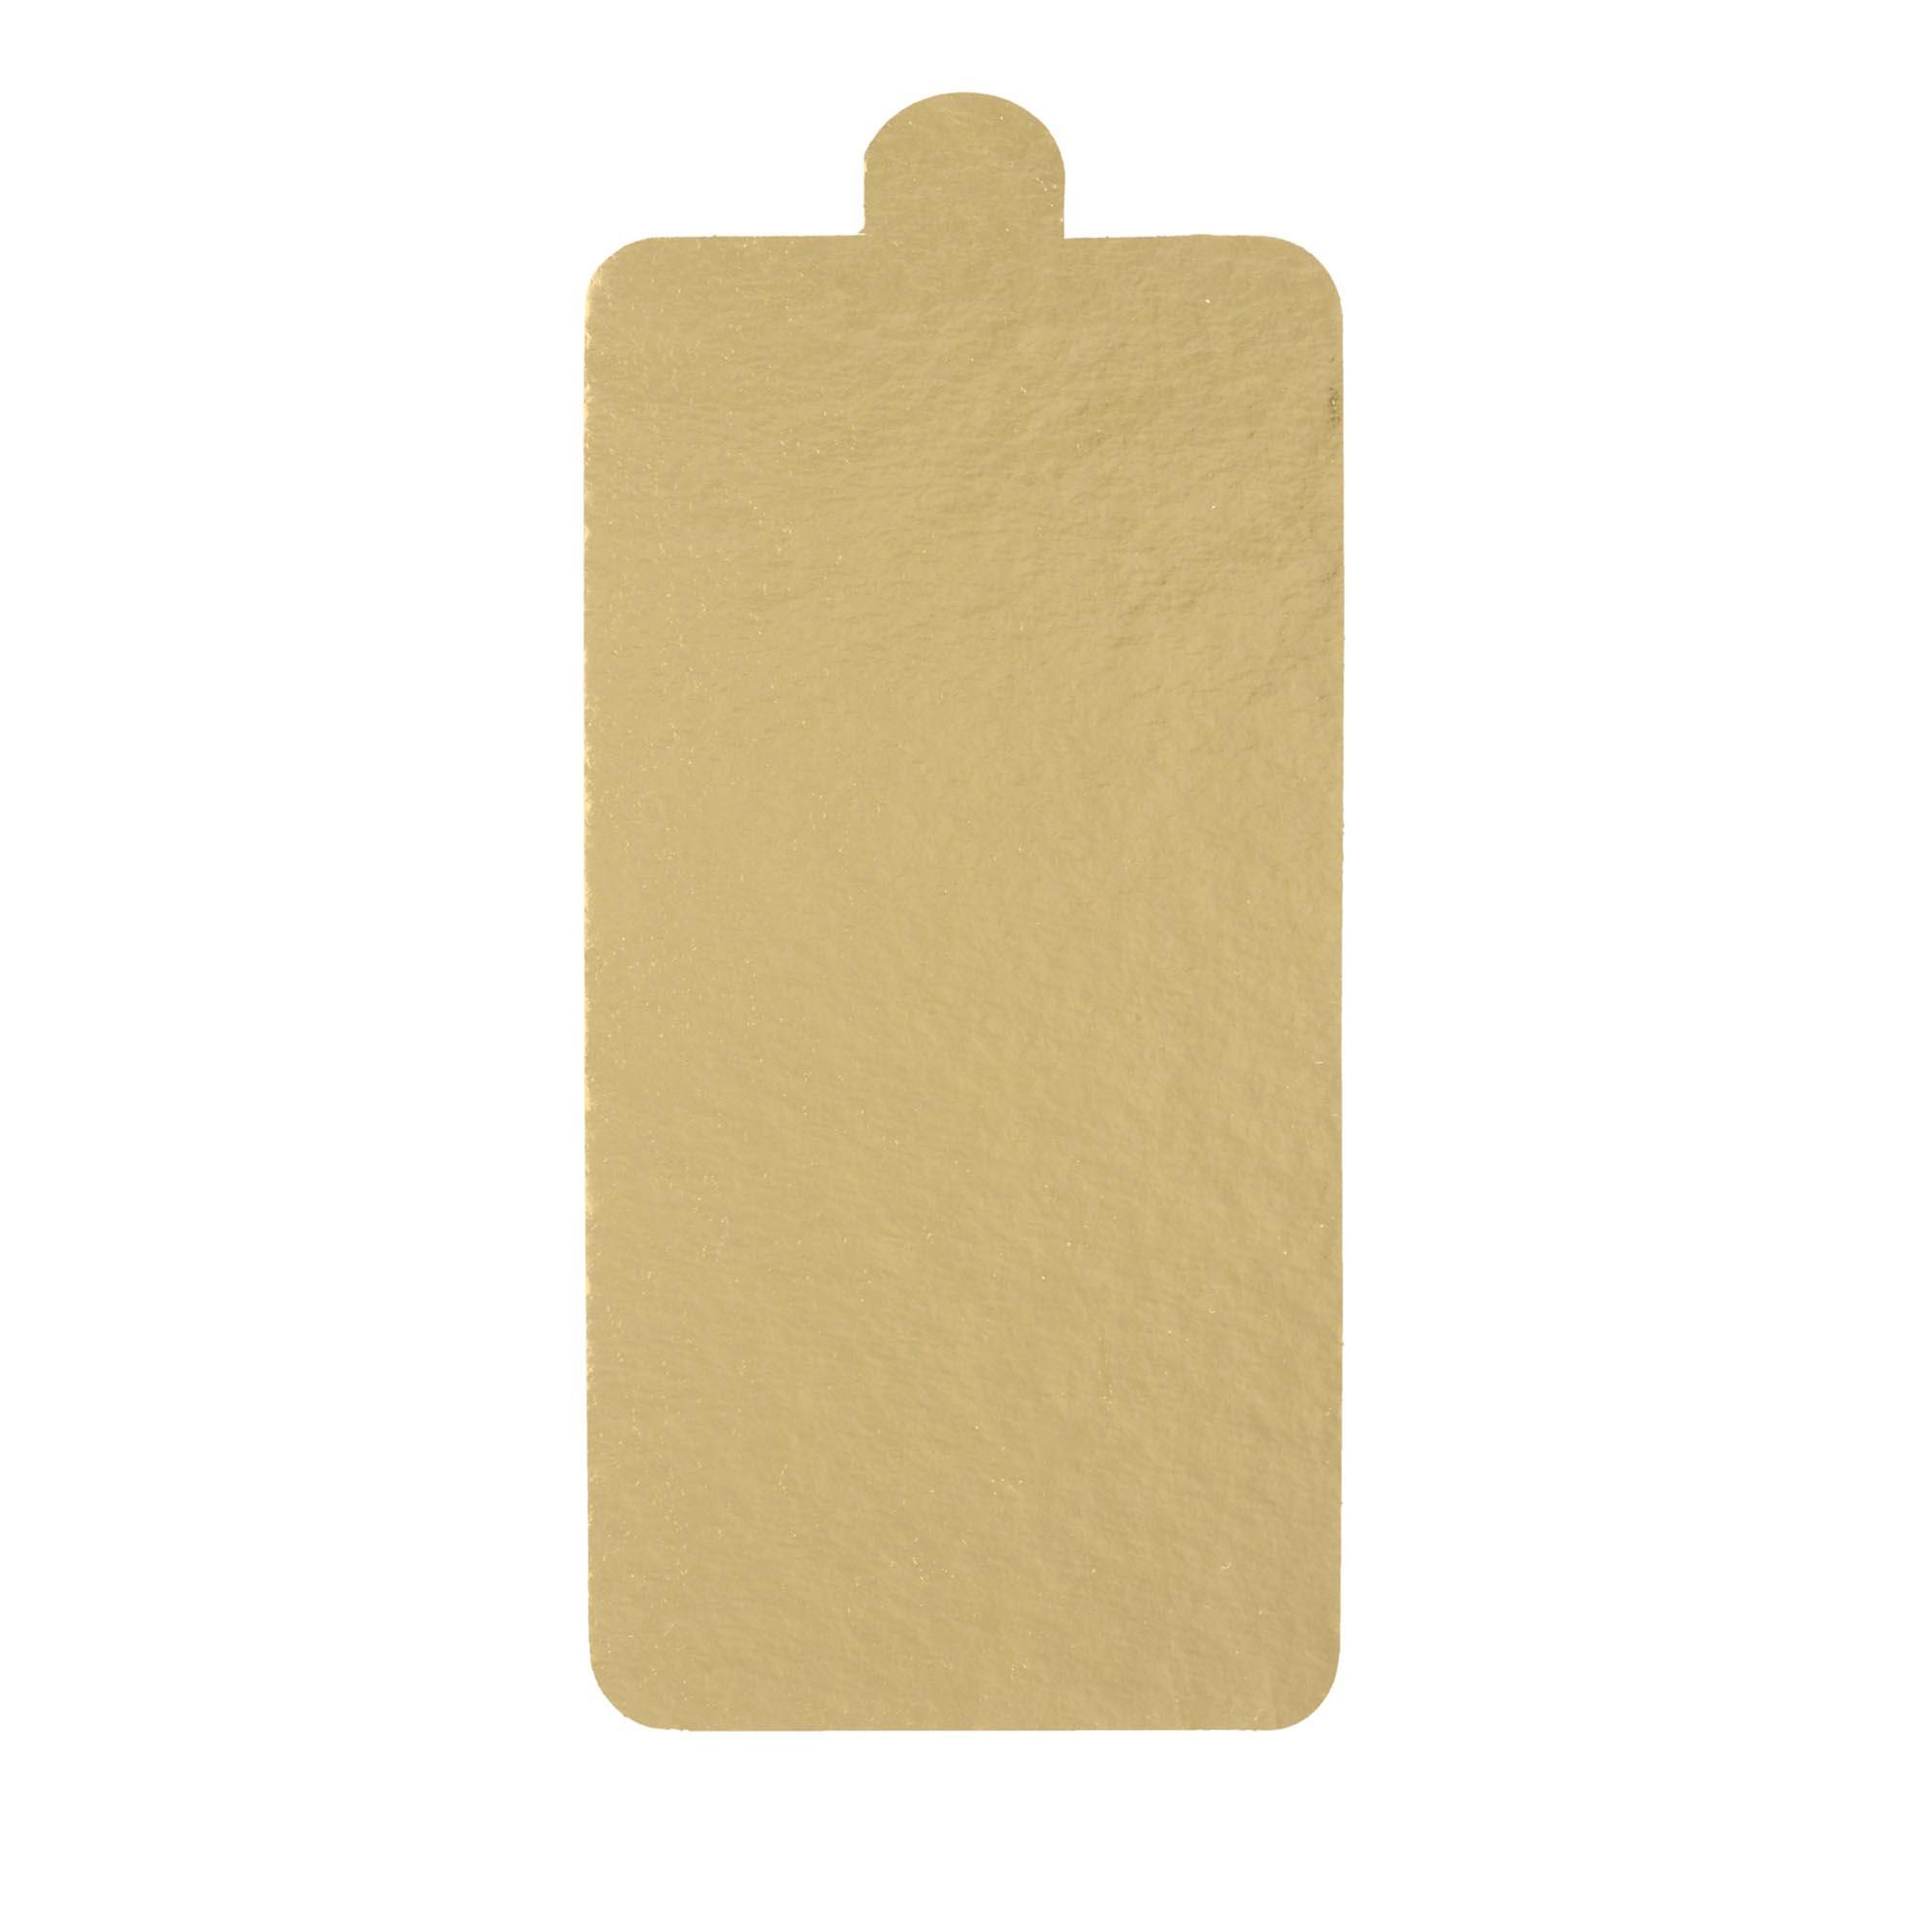 500 Bases Laminadas, Suporte P/ Bomba de Chocolate e Doces 14x7cm - Ouro